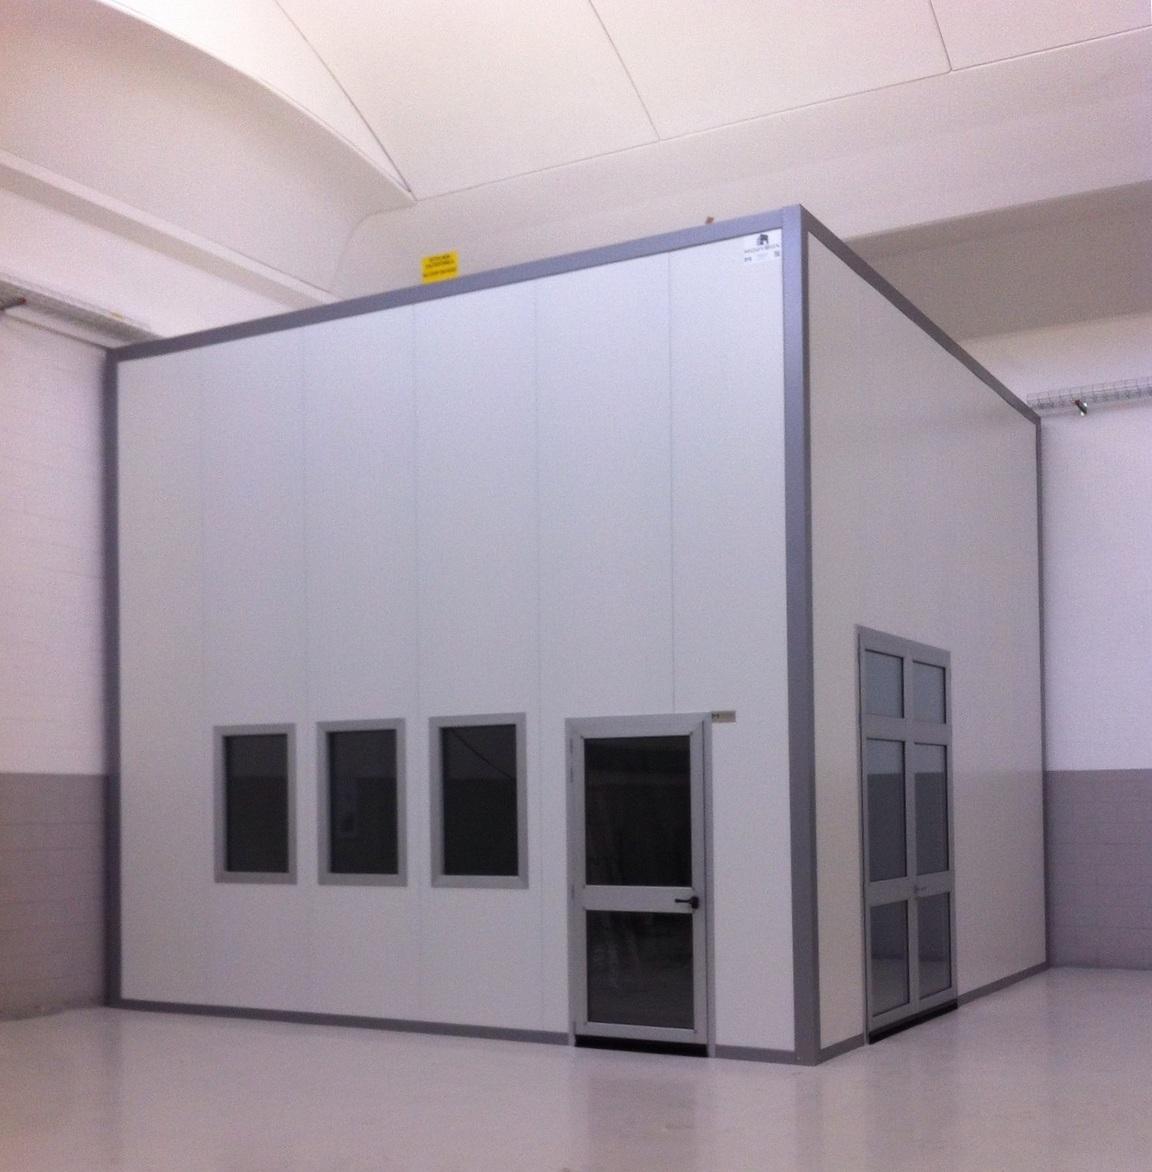 ModyBox_Cmm_Climatized_Cells_Cabine_Climatizzate_ModEn_0416